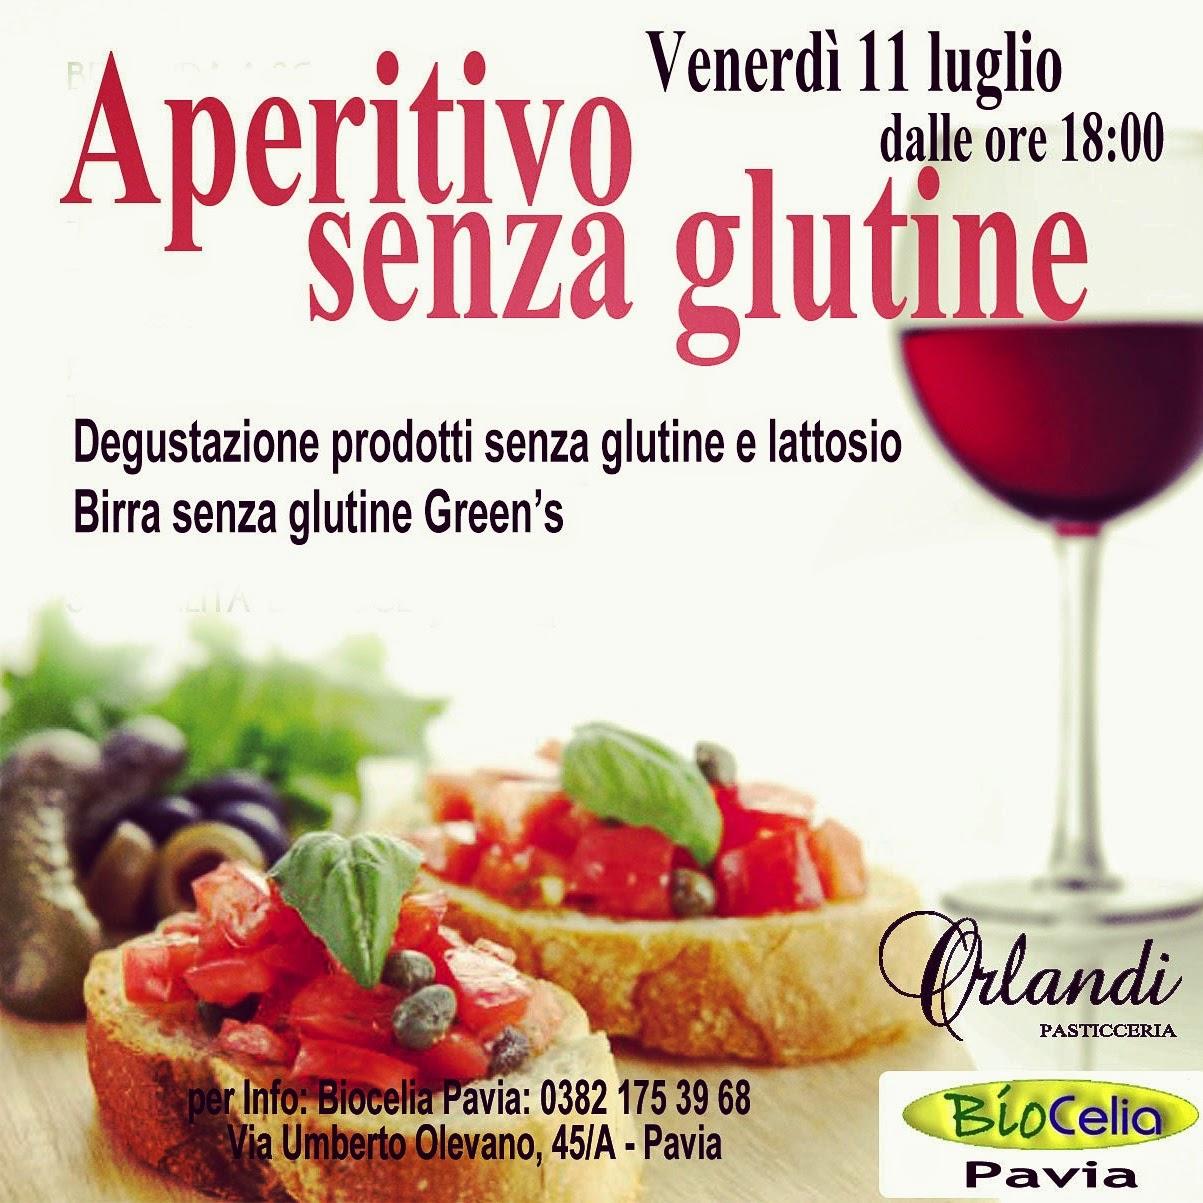 Aperitivo senza glutine a Pavia!